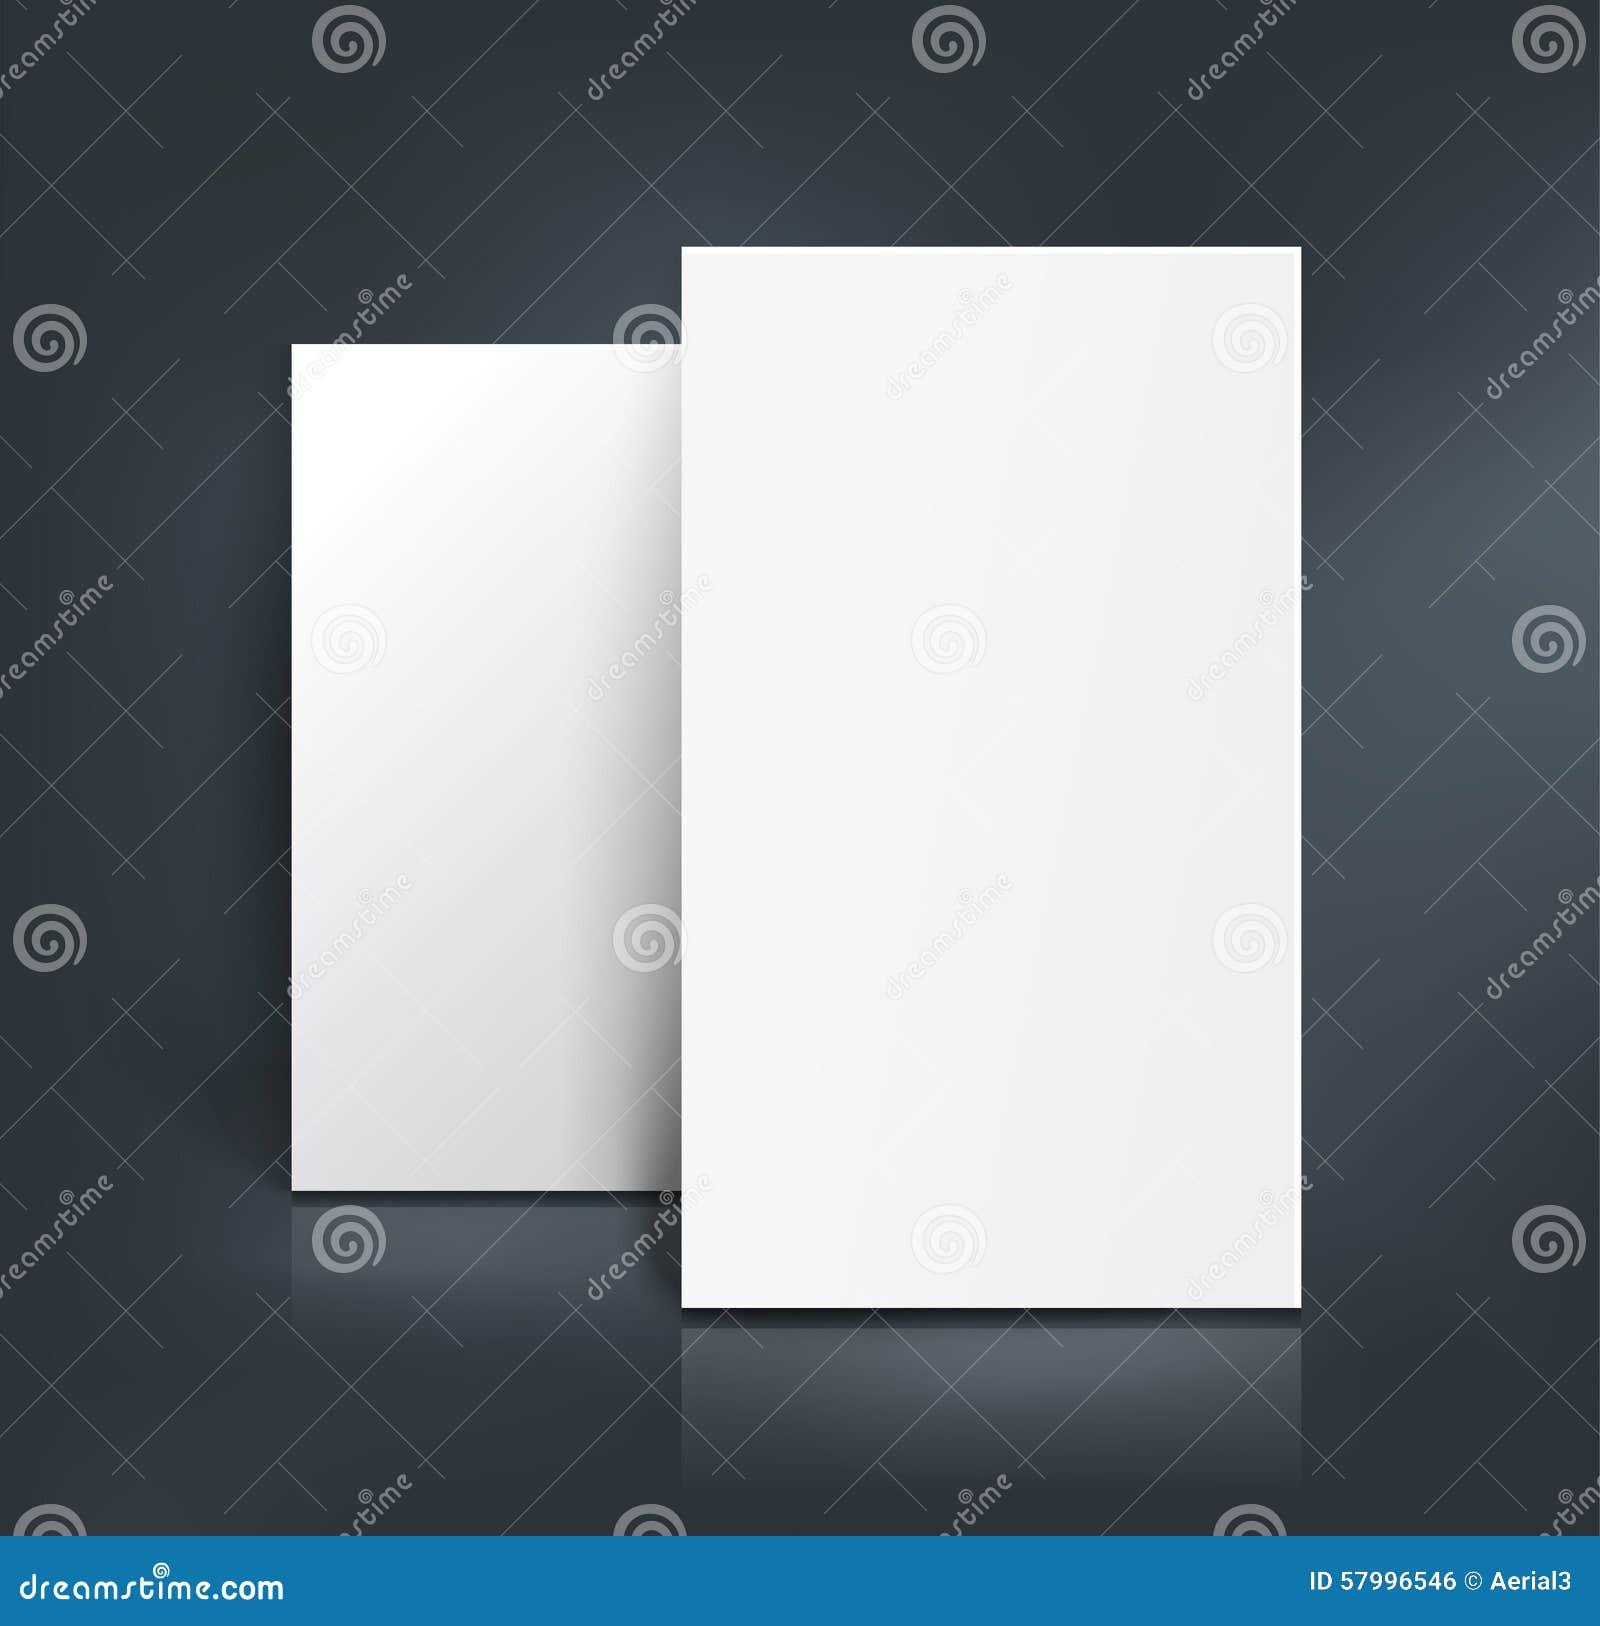 Business Cards Mockup. Vector Illustration Stock Vector ...